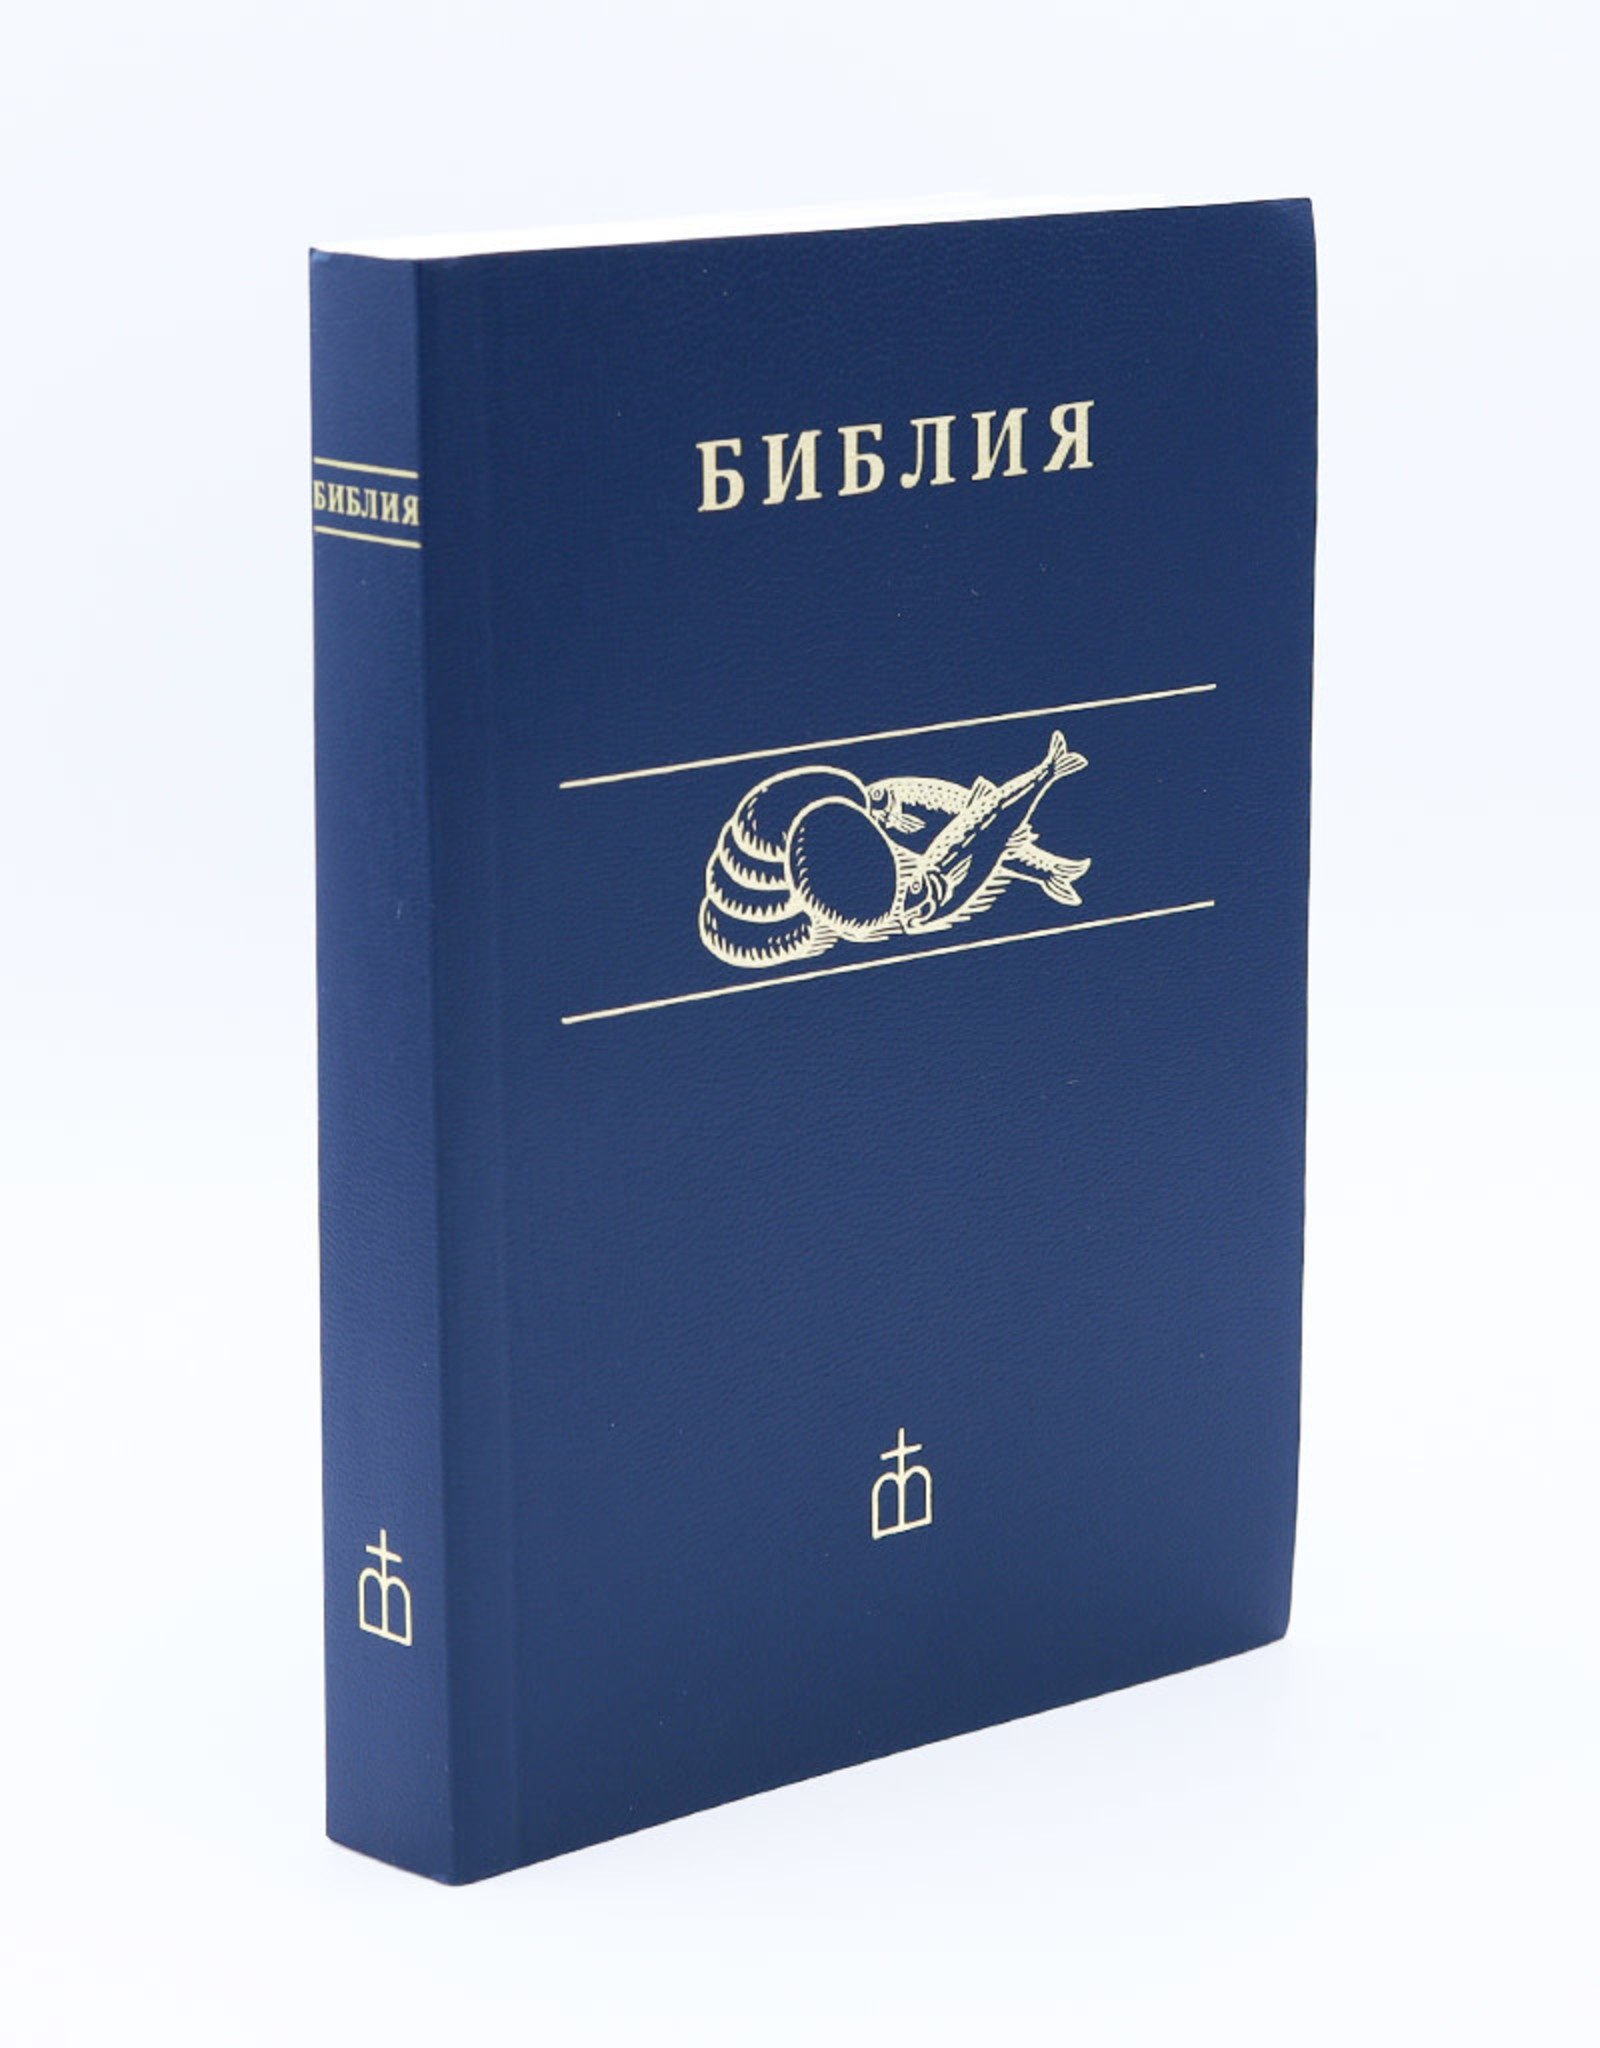 Библия, Каноническая (SYNO) Small Navy Softcover